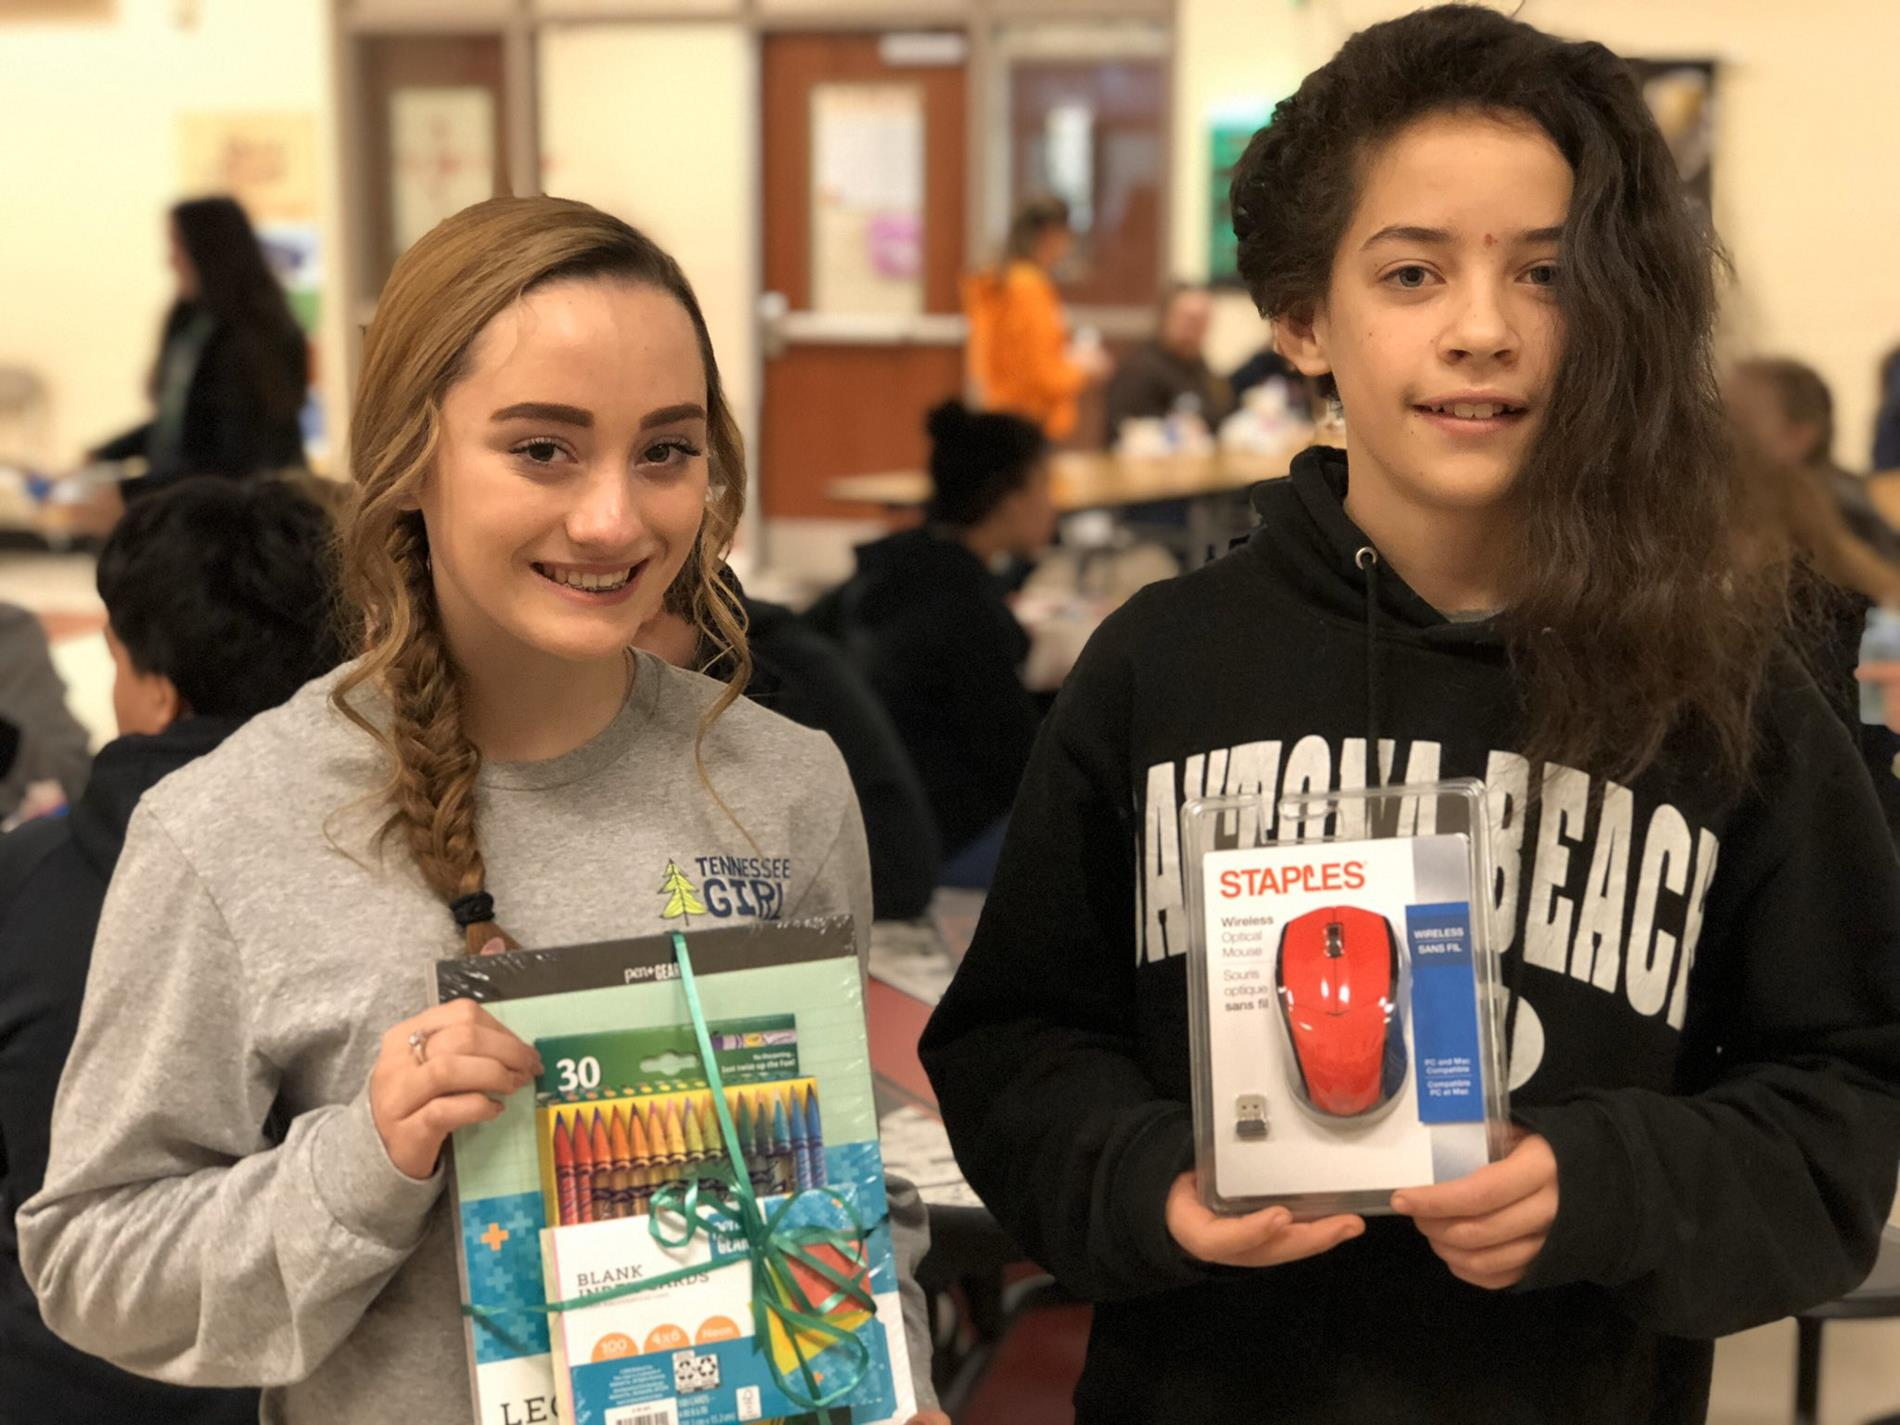 8th grade prize winners